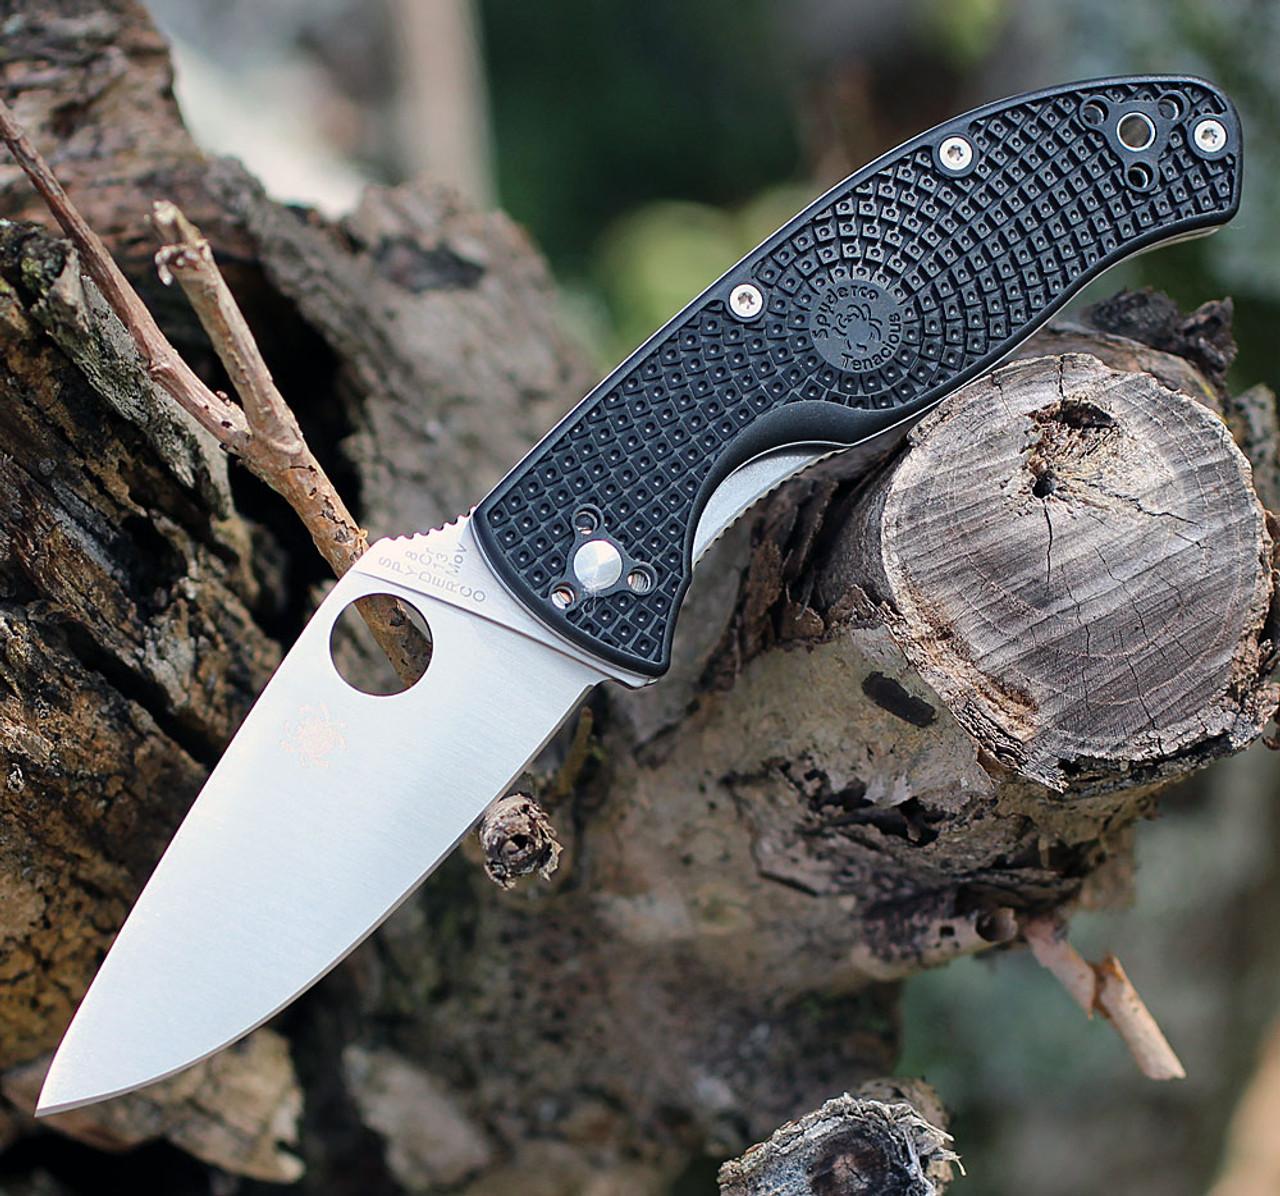 "Spyderco Tenacious Lightweight C122PBK, 3.39"" 8Cr13MoV Plain Blade, Black FRN Handle"